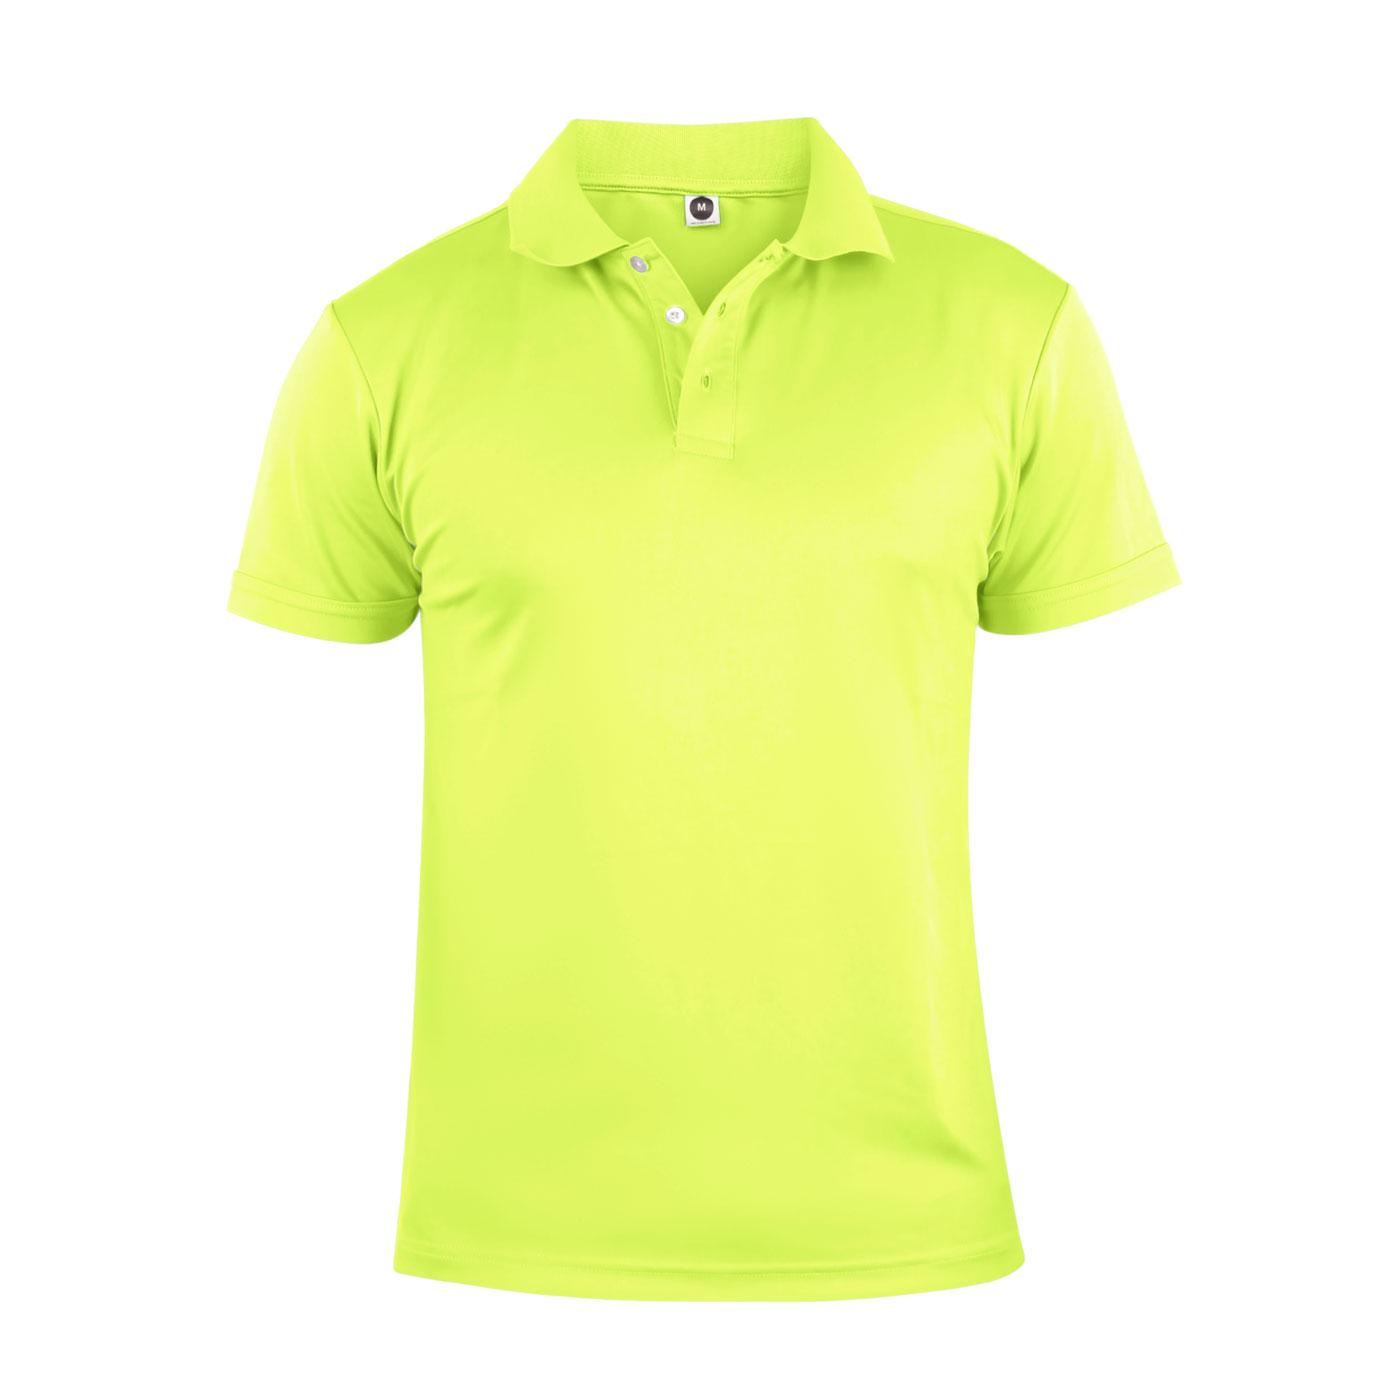 HODARLA 彈力涼感短袖POLO衫 3113901 - 螢光黃